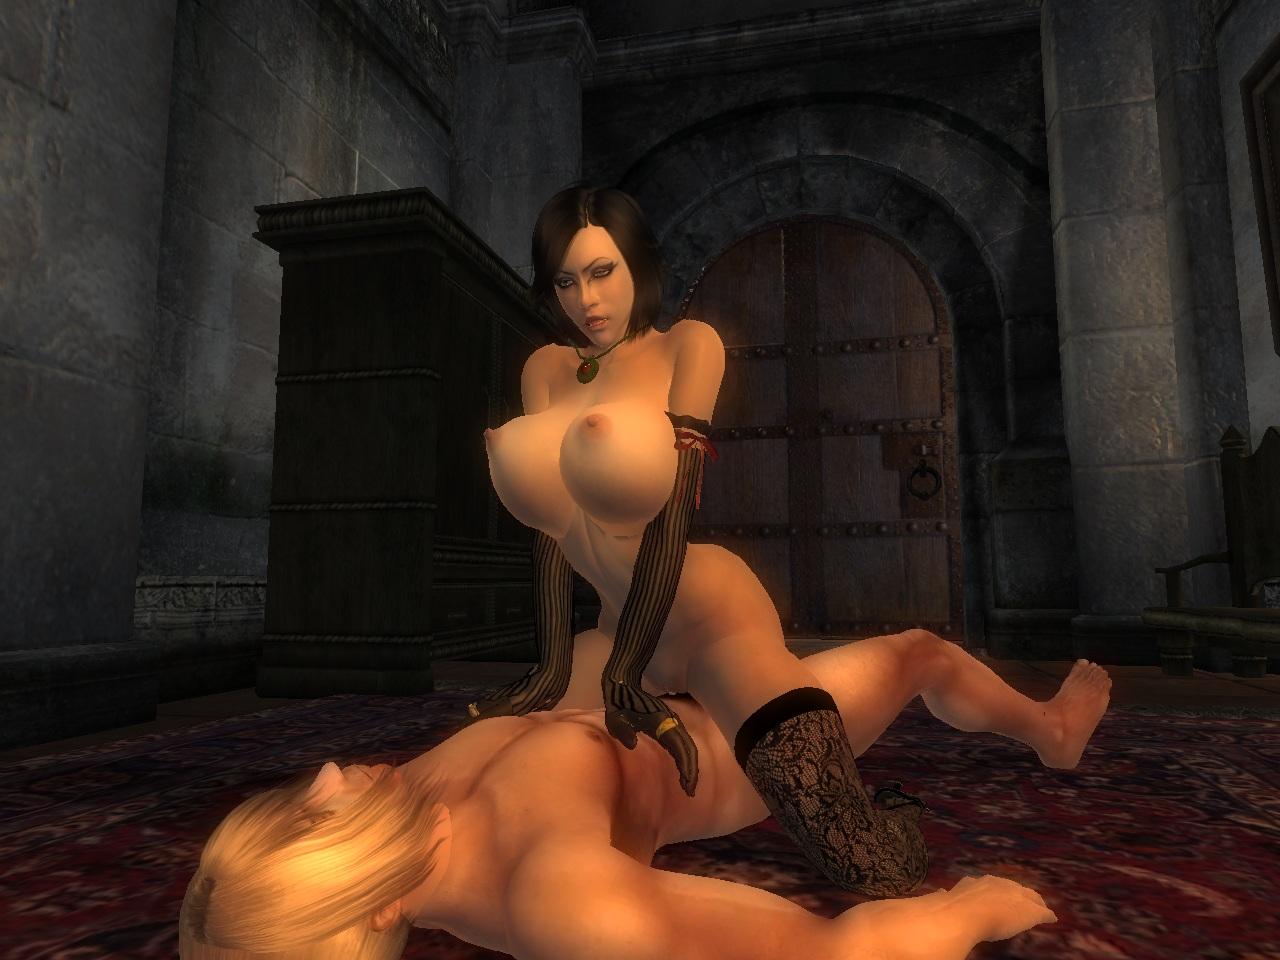 Oblivion nude skin mods